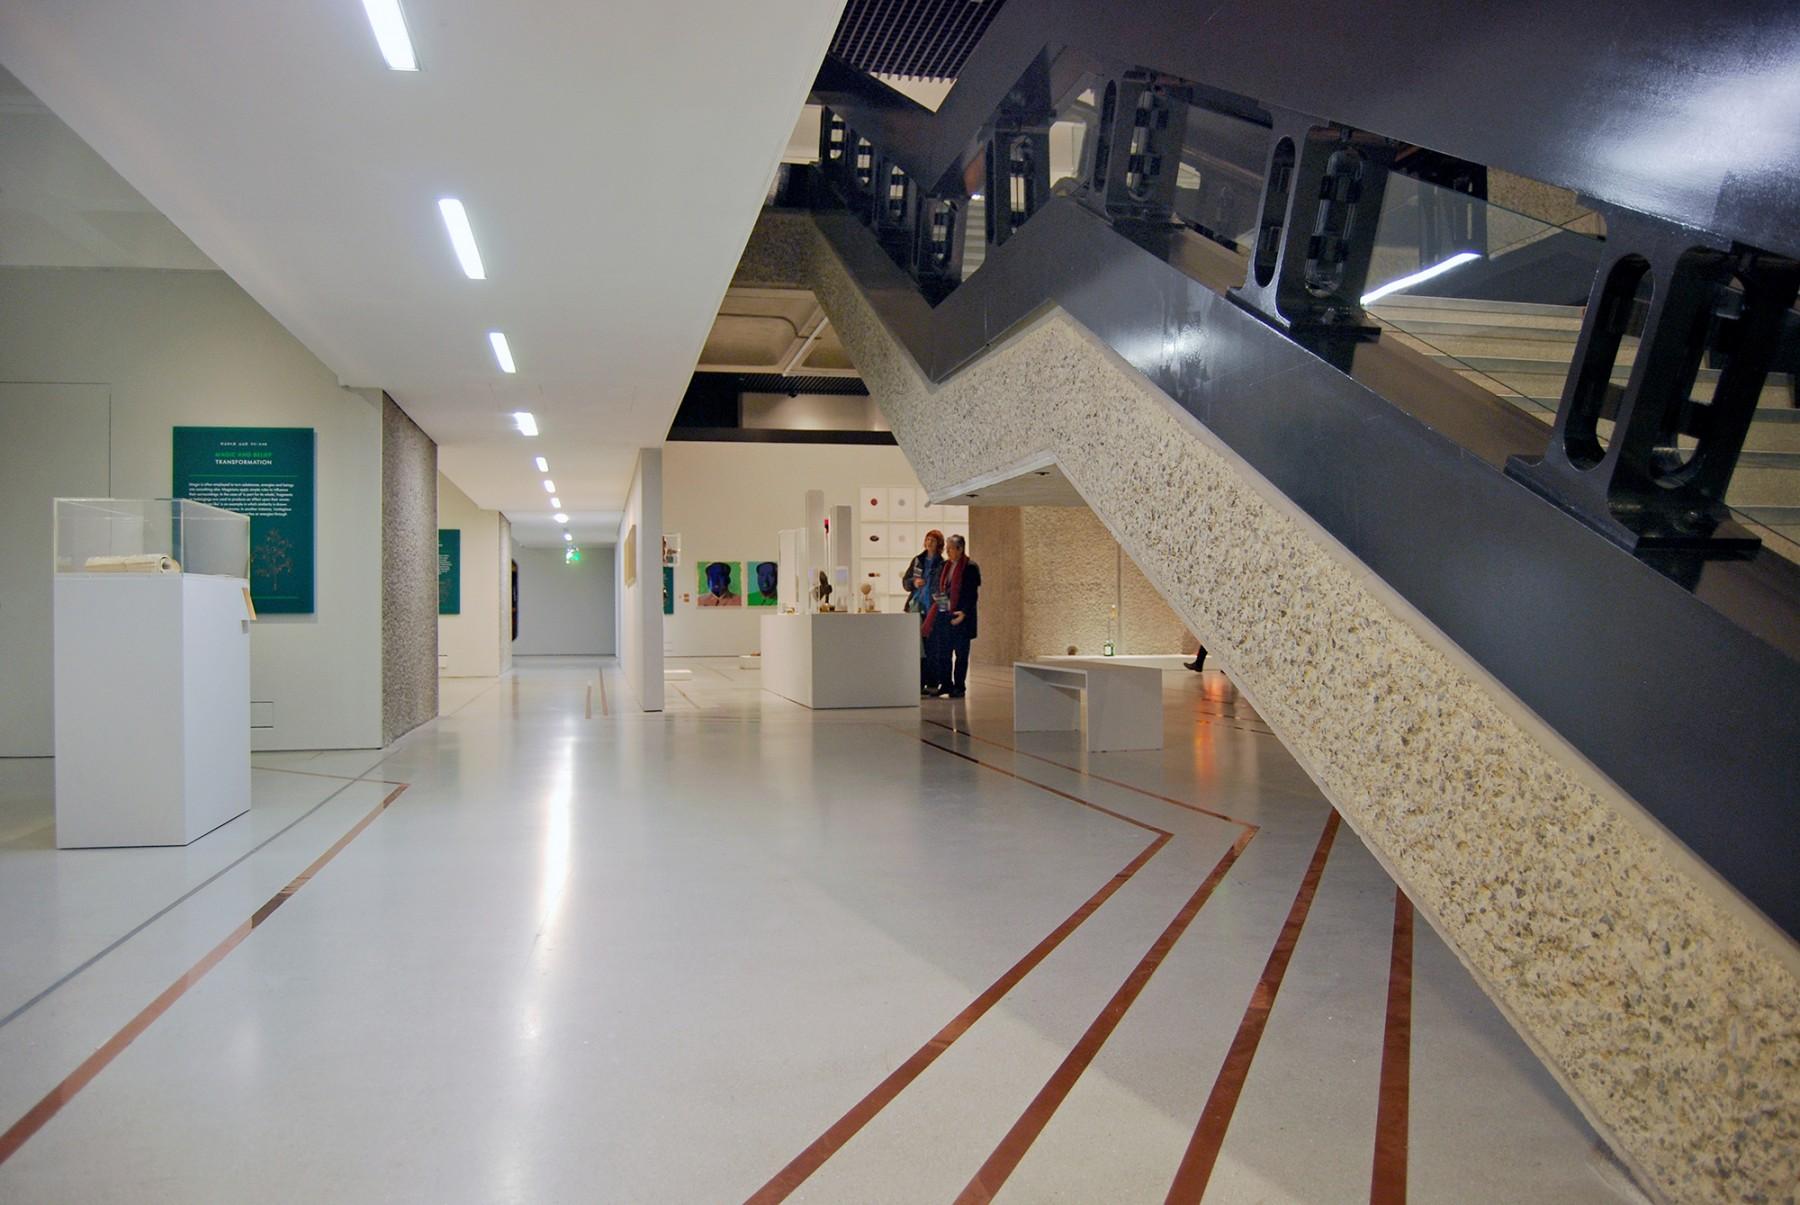 Martian-Museum-Terrestrial-art-Barbican-London-contemporary-design-exhibition-gallery-Jamie-Fobert-Architects-3